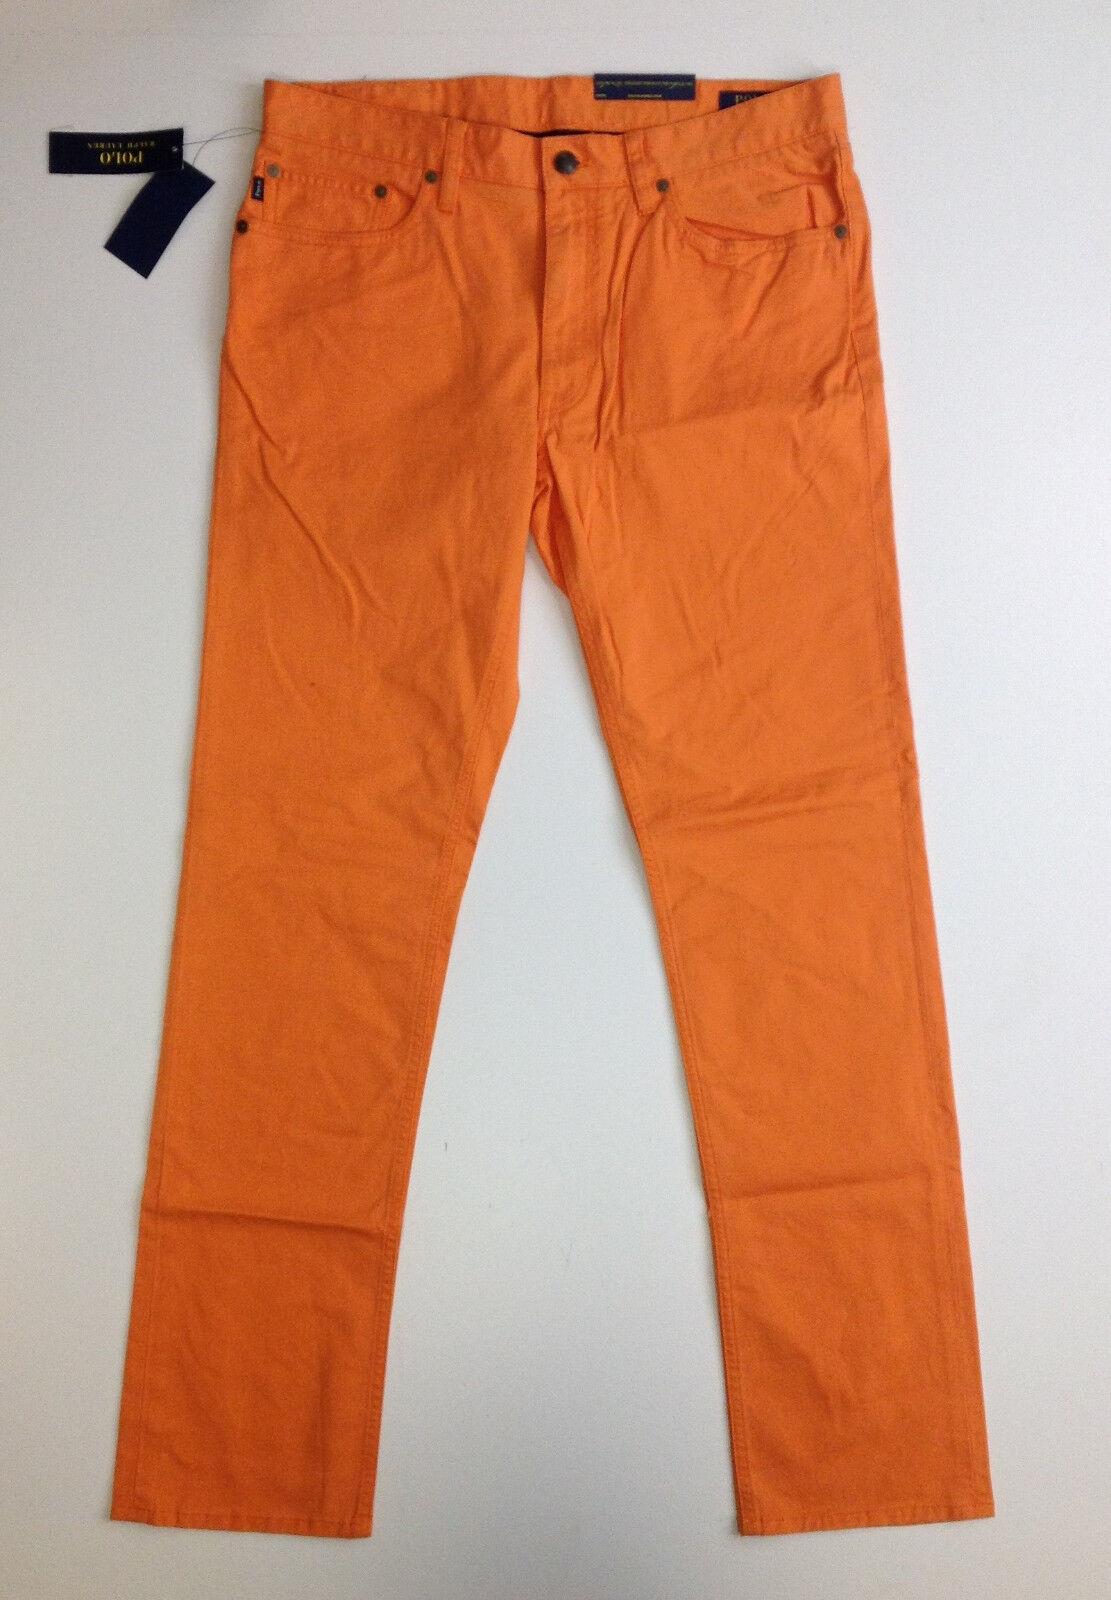 POLO RALPH LAUREN Bedford STRETCH SLIM STRAIGHT Pants, orange, 32x32